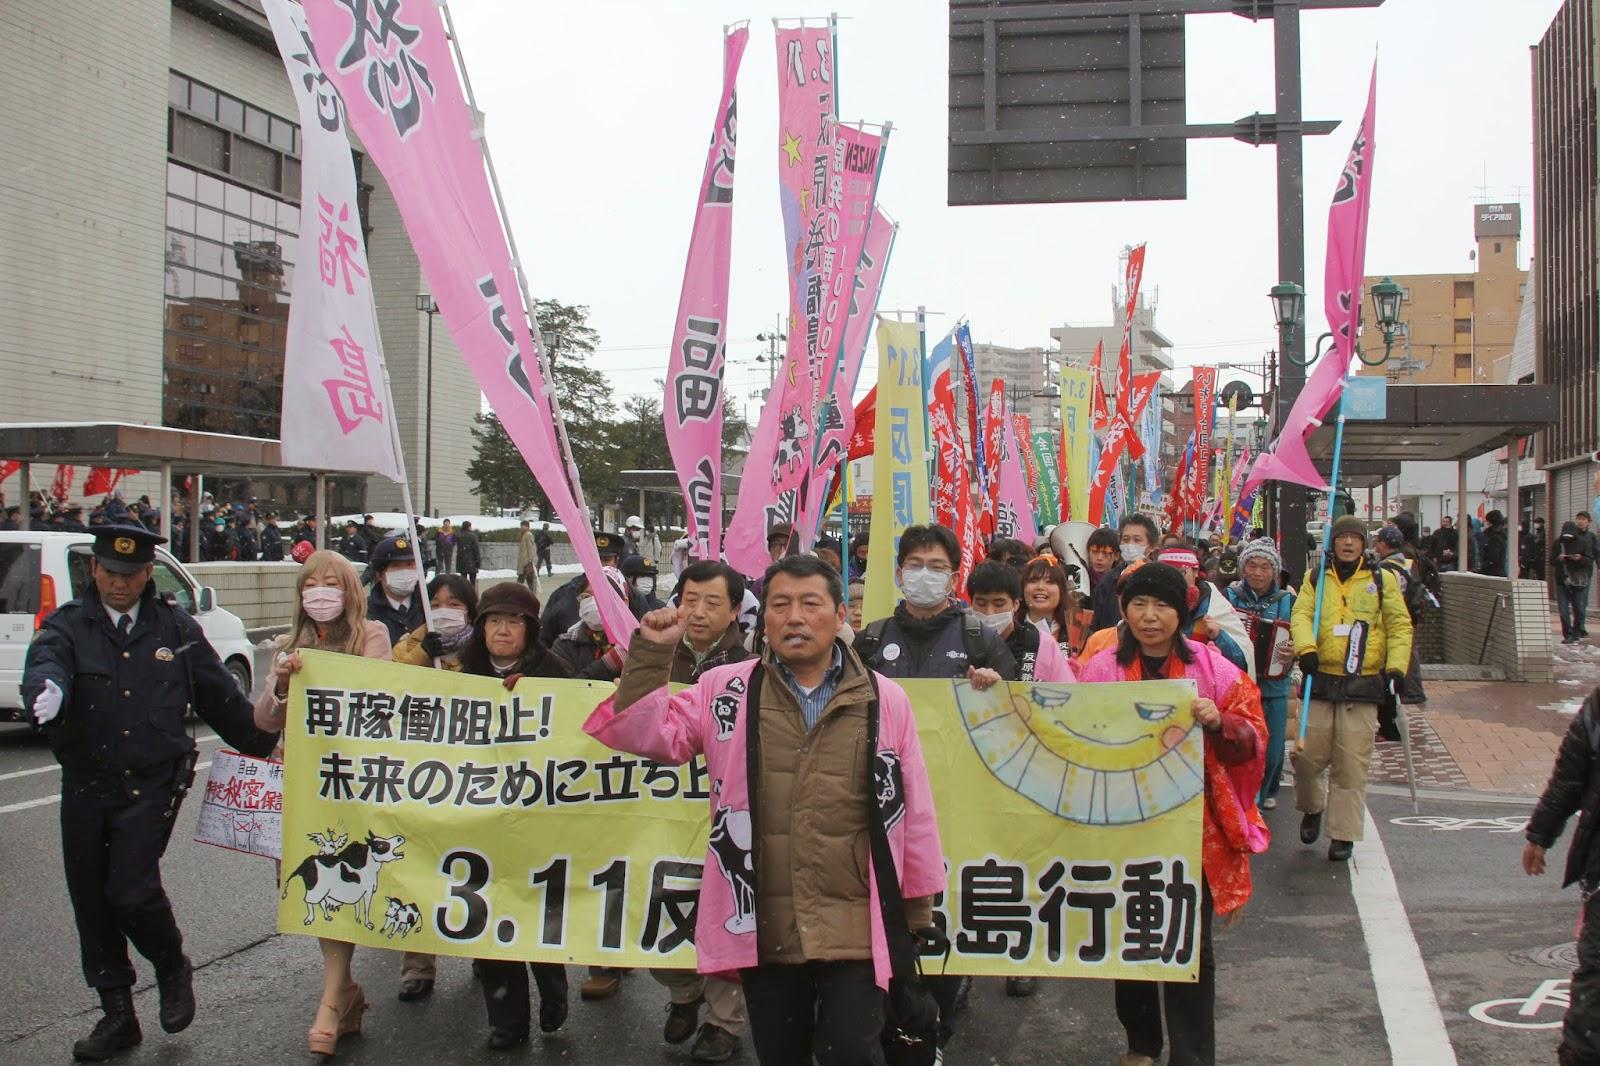 http://www.doro-chiba.org/nikkan_dc/n2015_01_06/n7874..htm